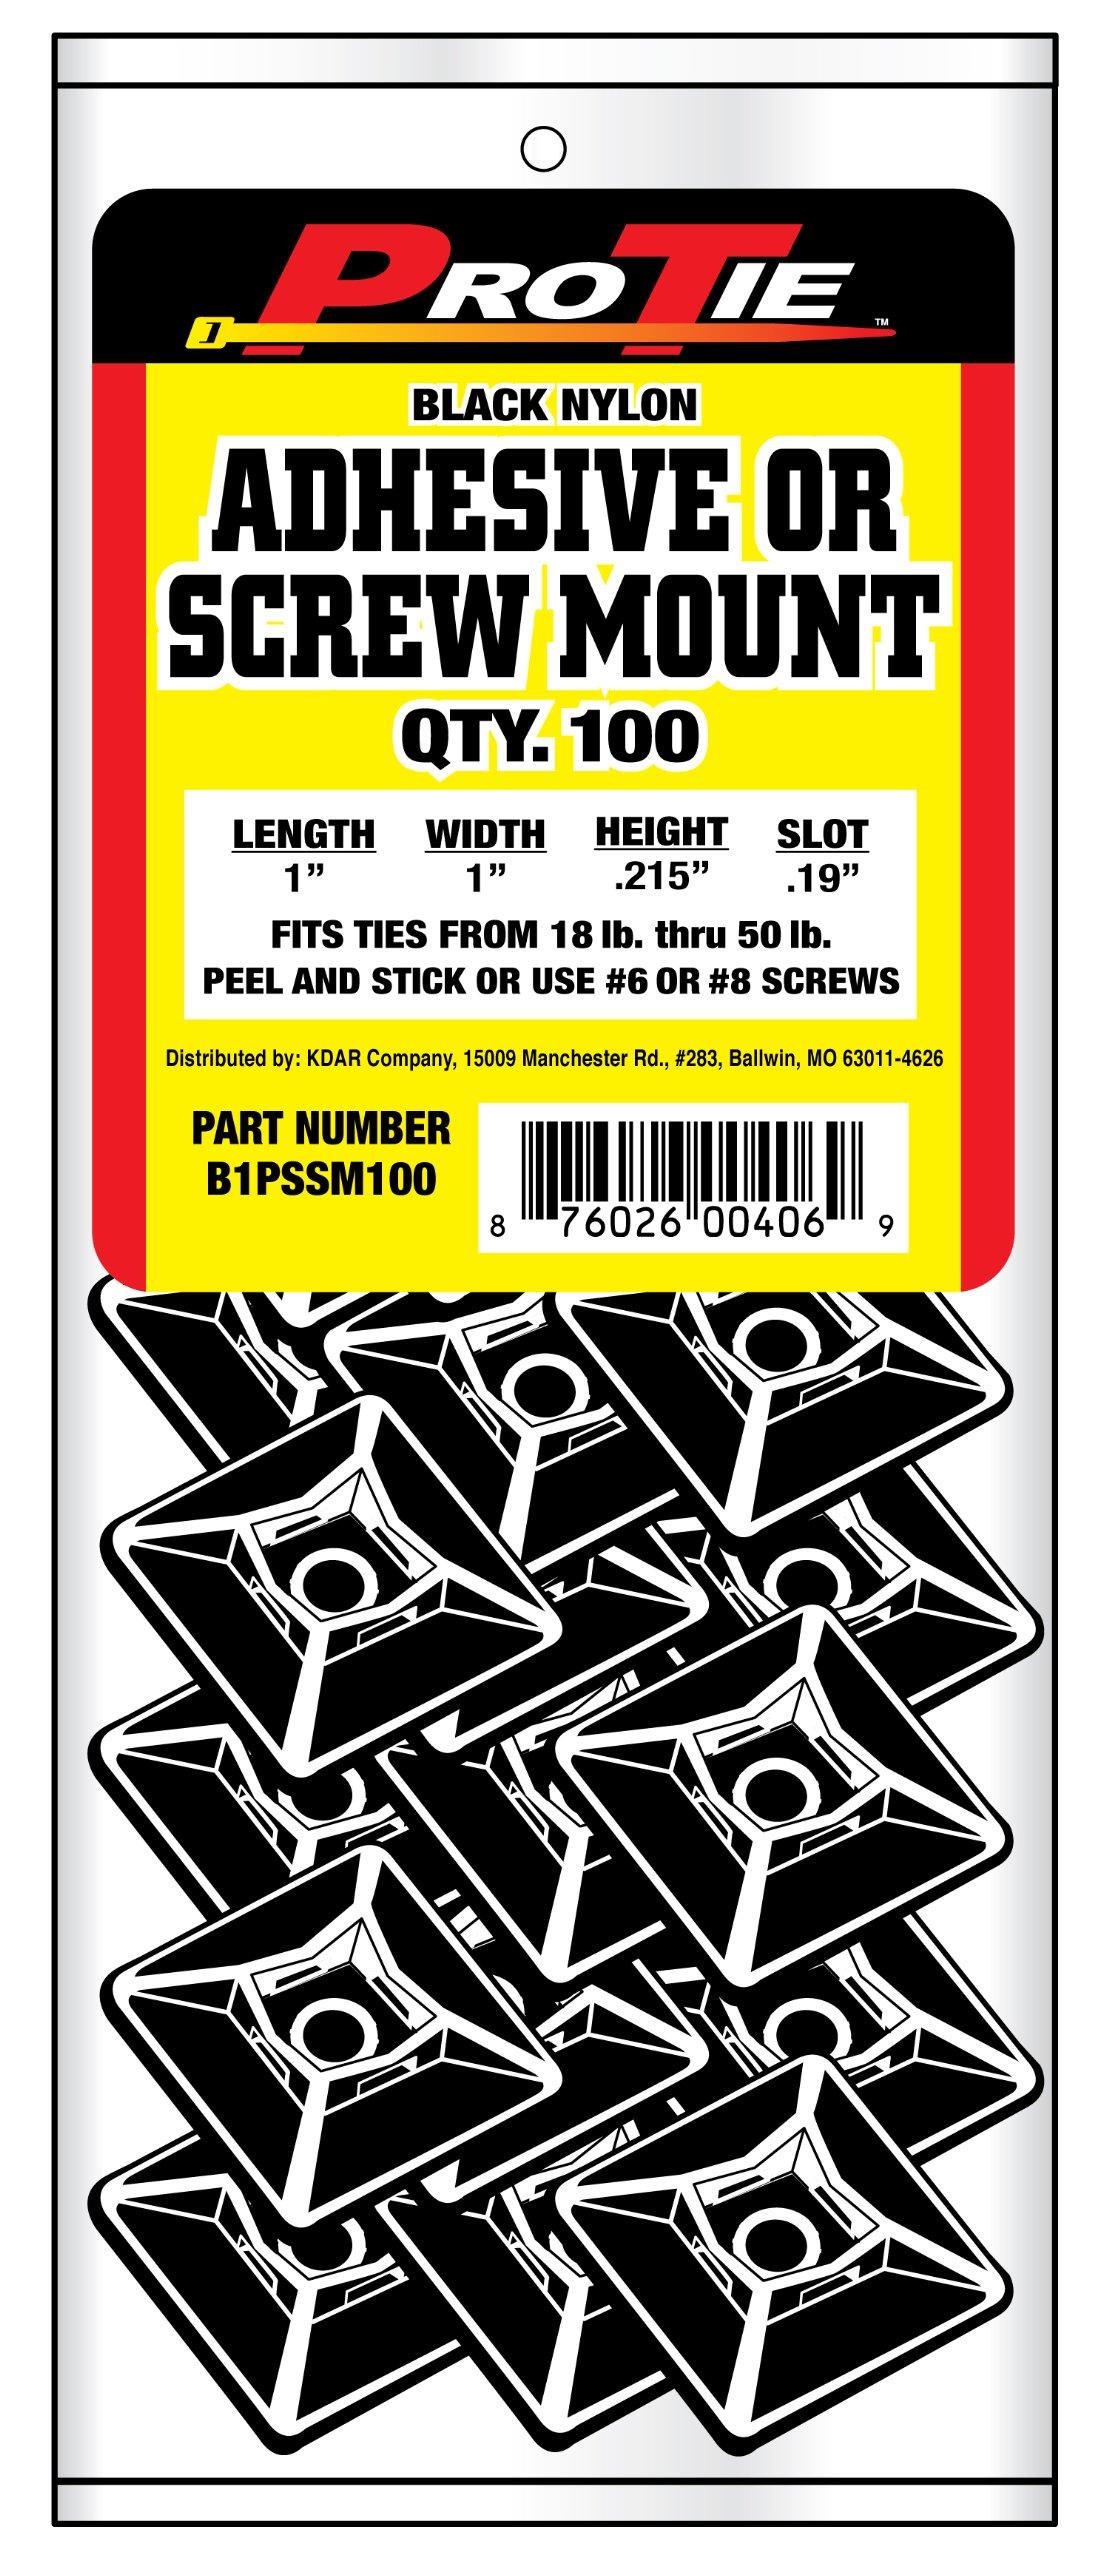 Pro Tie B1PSSM100 1-Inch Adhesive or Screw Mount Cable Tie Mount, Black Nylon, 100-Pack